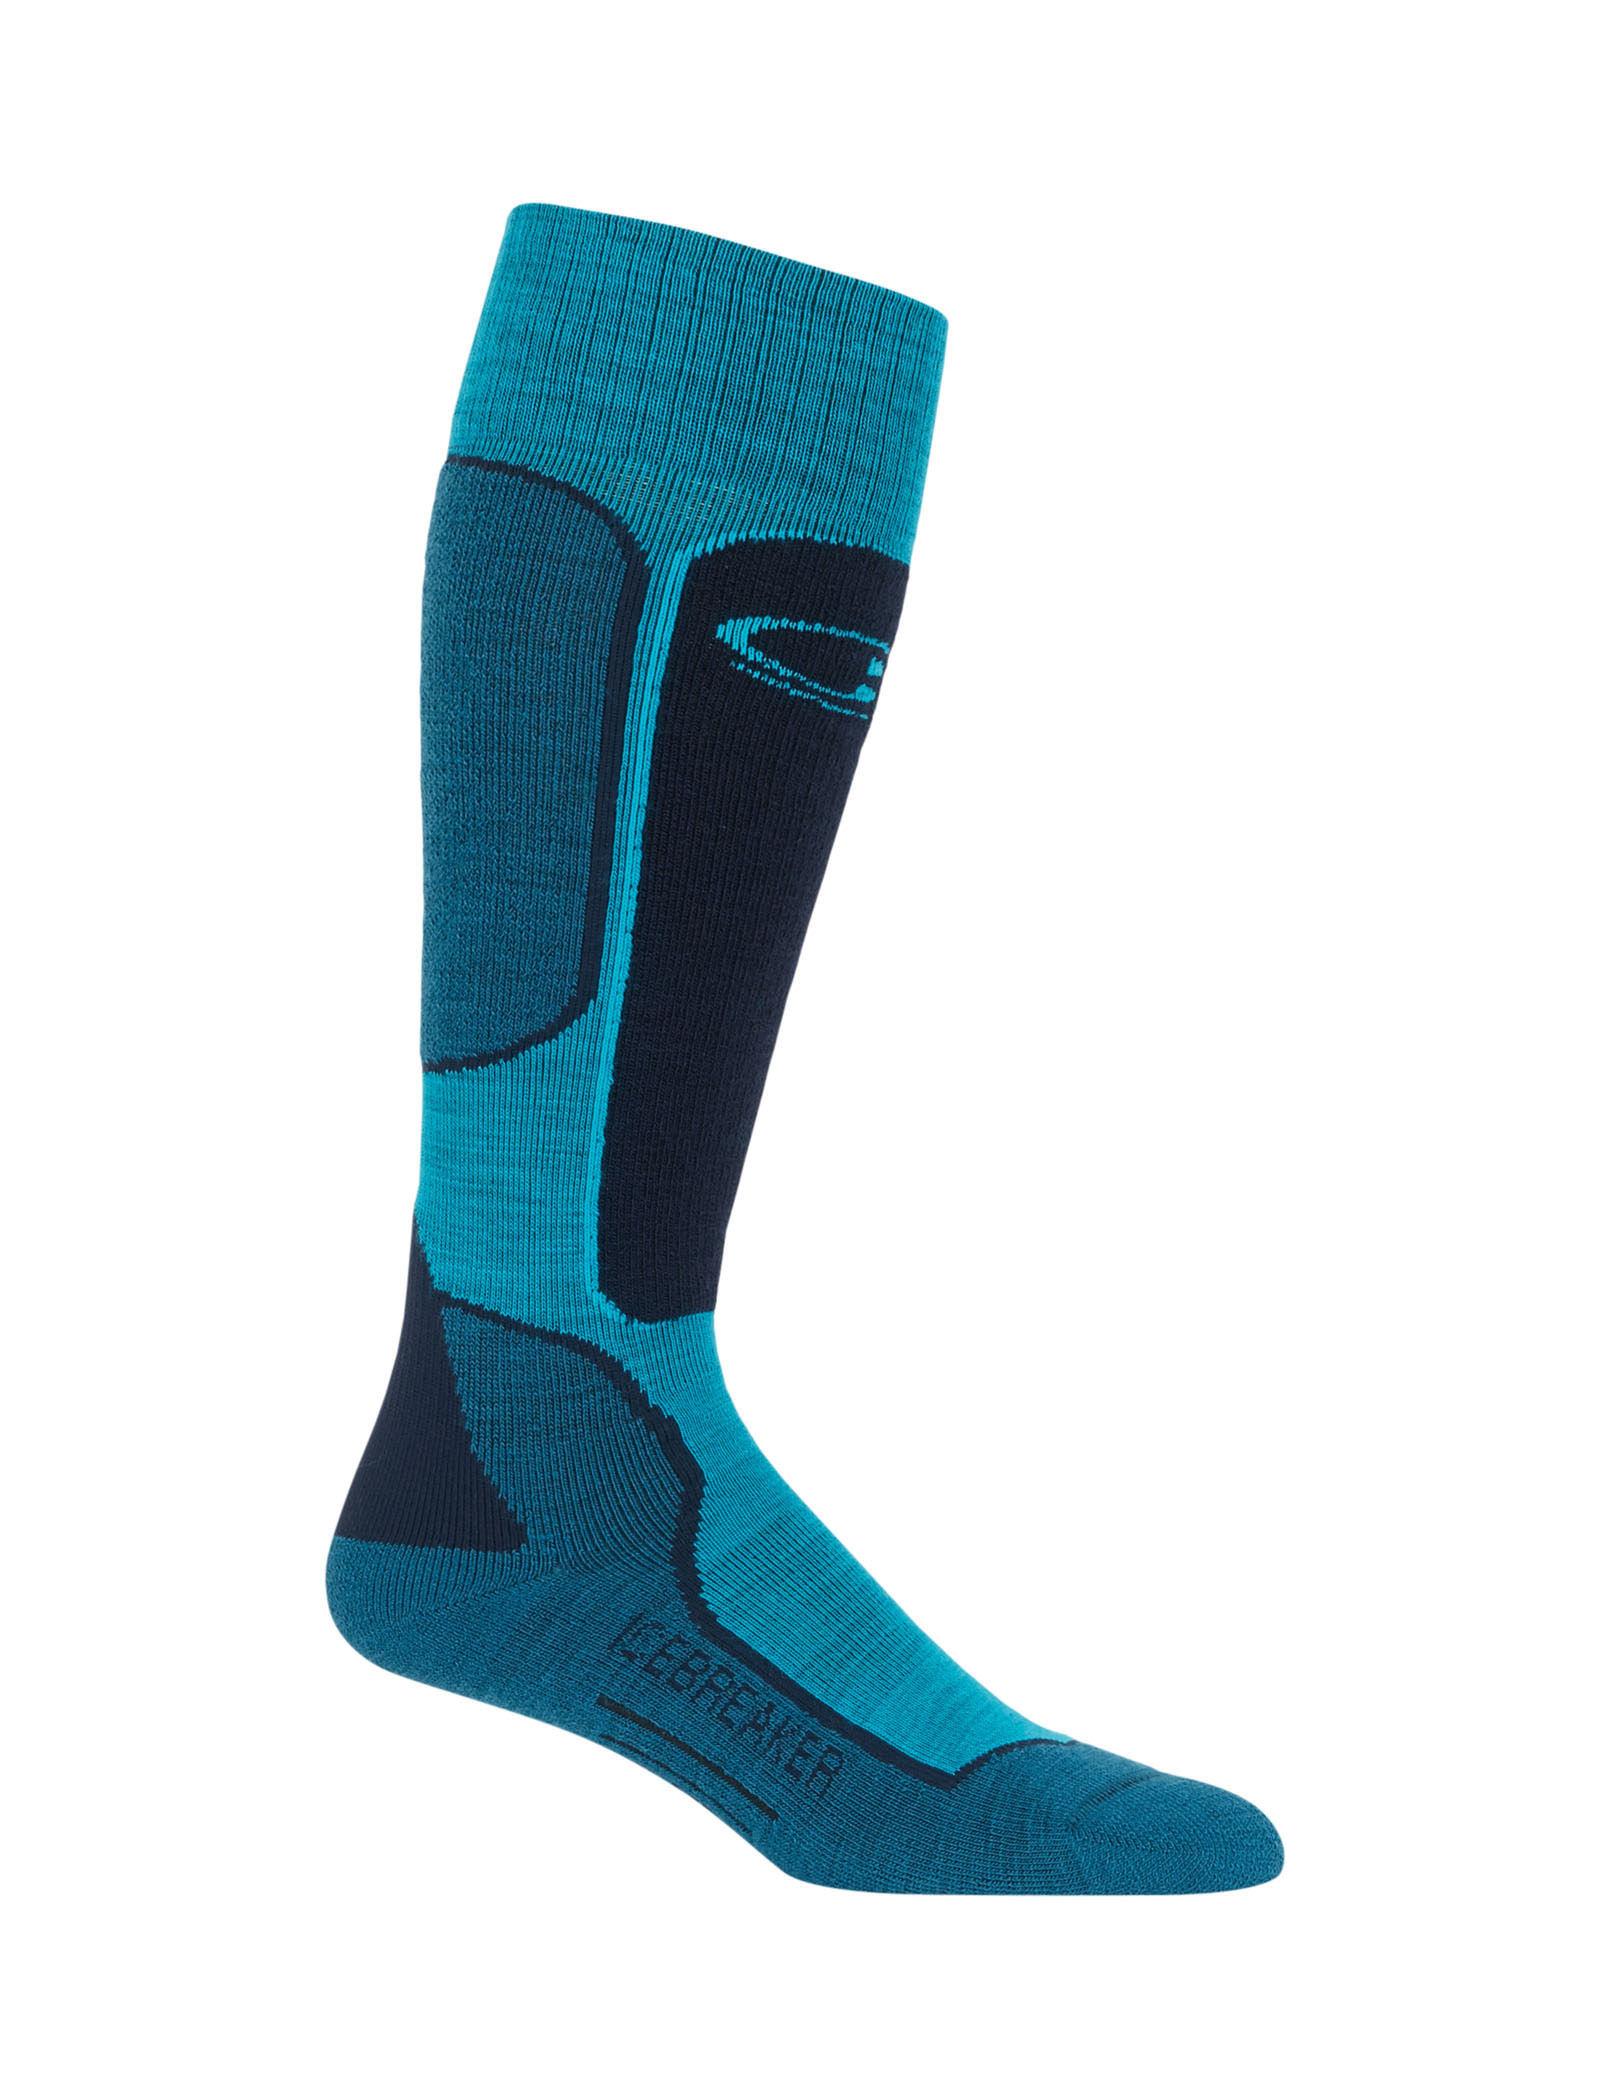 Icebreaker - Ski + Lite Over The Calf - Ski socks - Women's